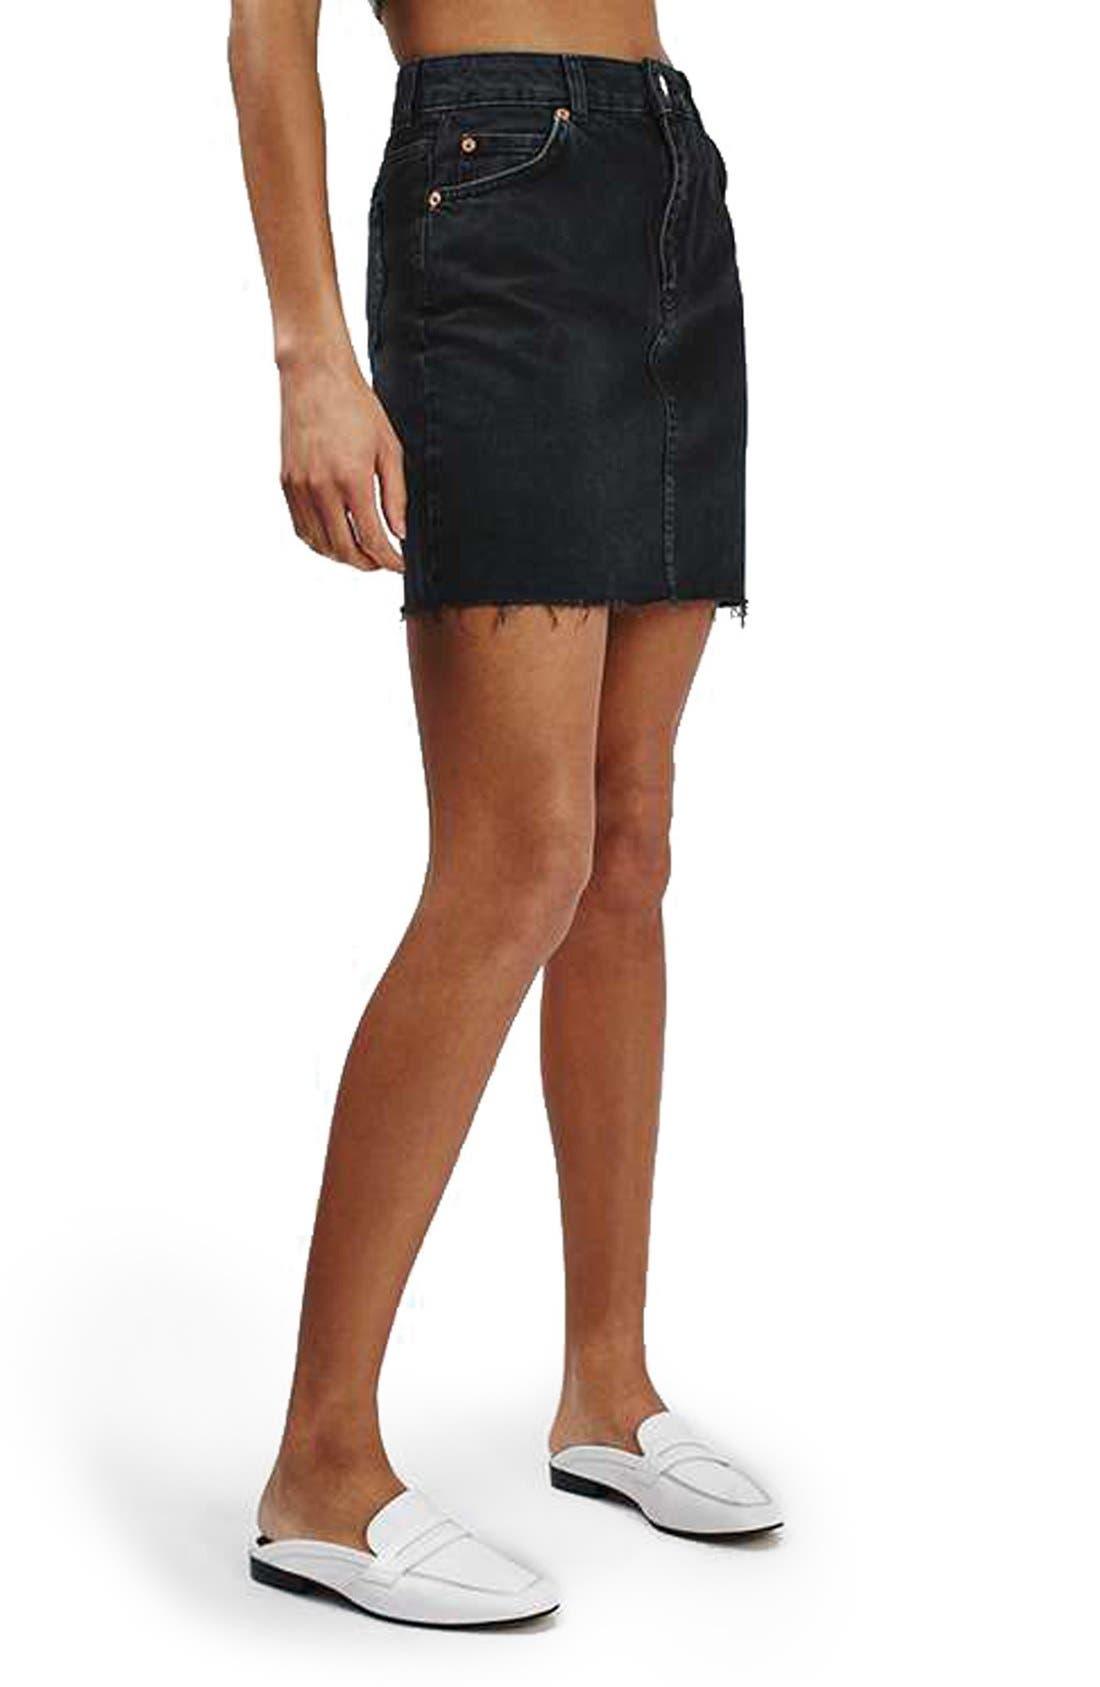 Alternate Image 1 Selected - Topshop Moto High Rise Raw Hem Denim Skirt